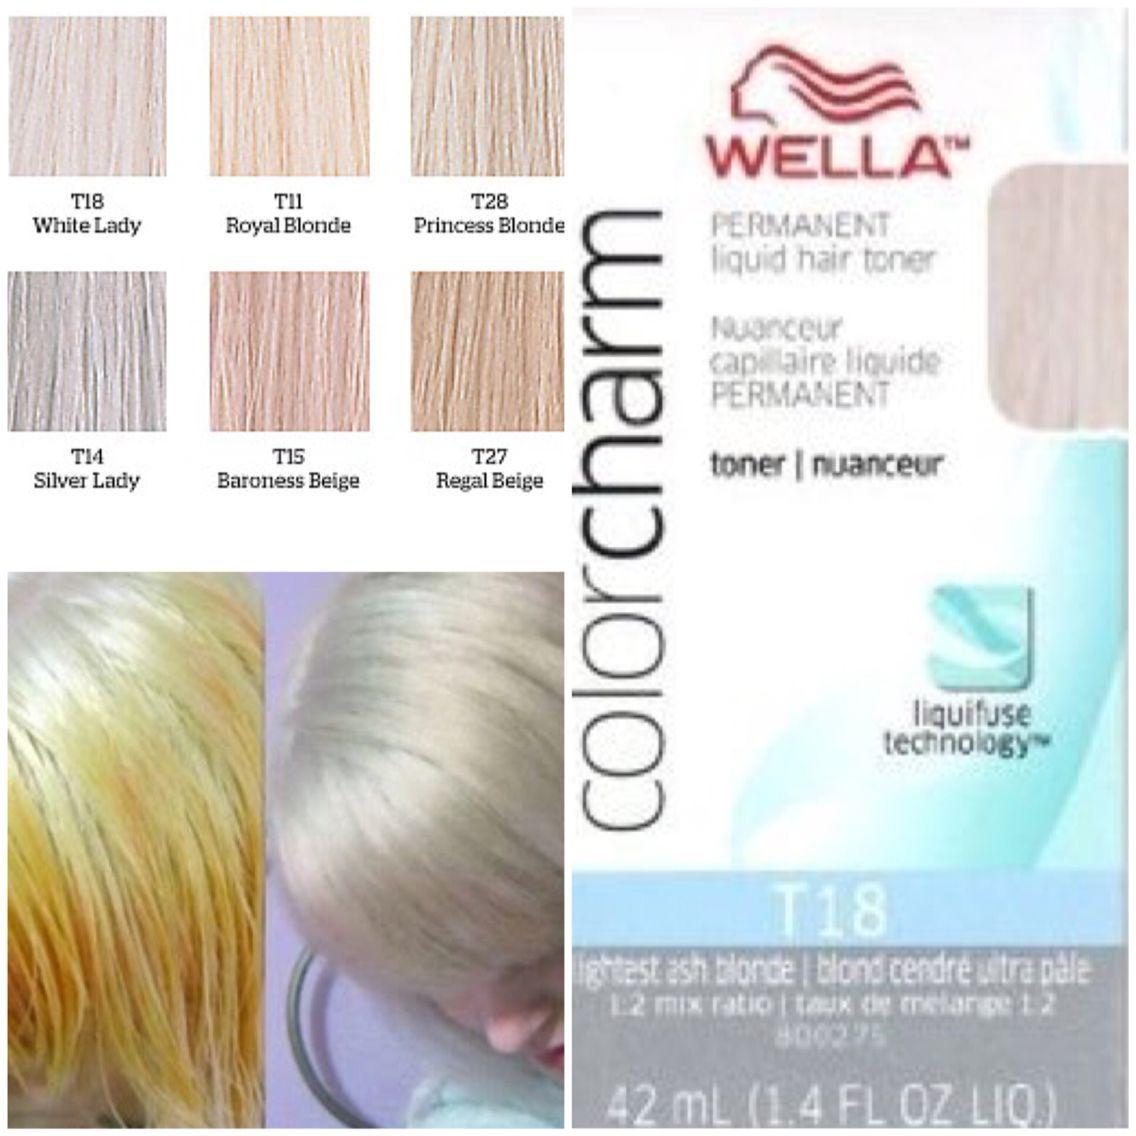 Wella T 18 Toner For Blonde Platinum Hair Pre Lighten The Hair With Wella Bleach To Desired Level B In 2021 Toner For Blonde Hair Hair Color Formulas Wella Hair Toner